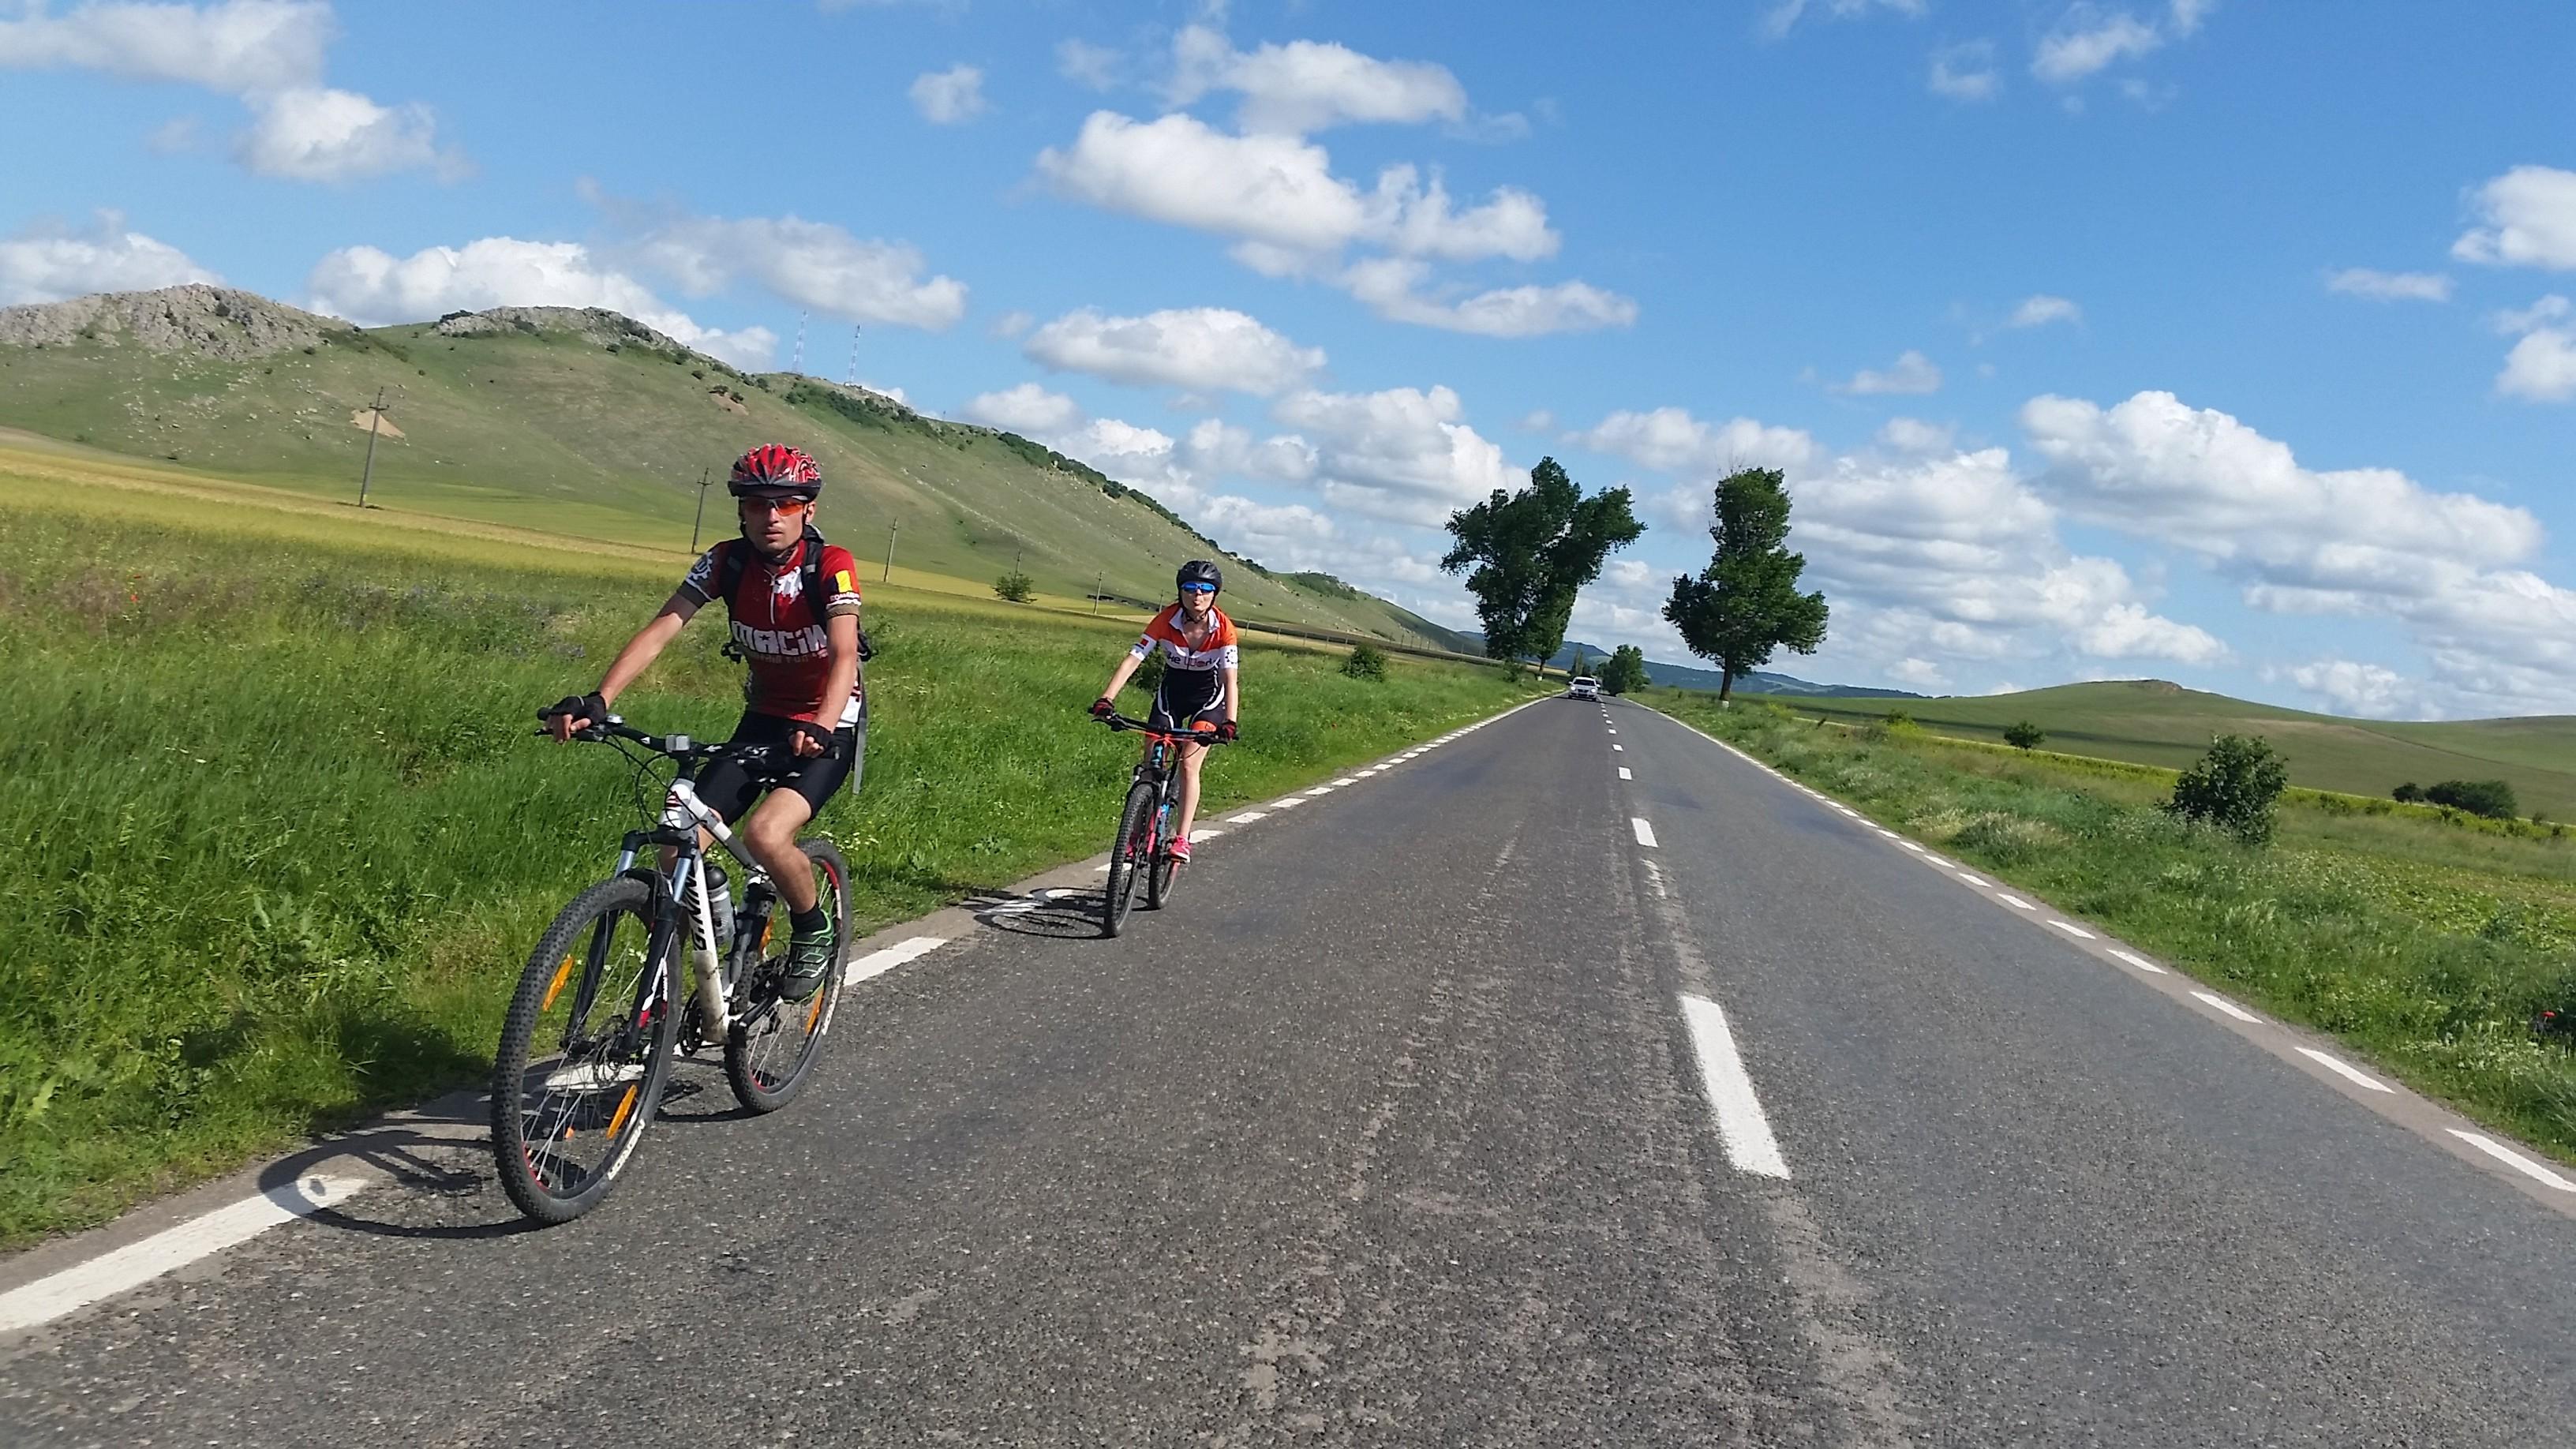 tura Bike Works - lacob Deal